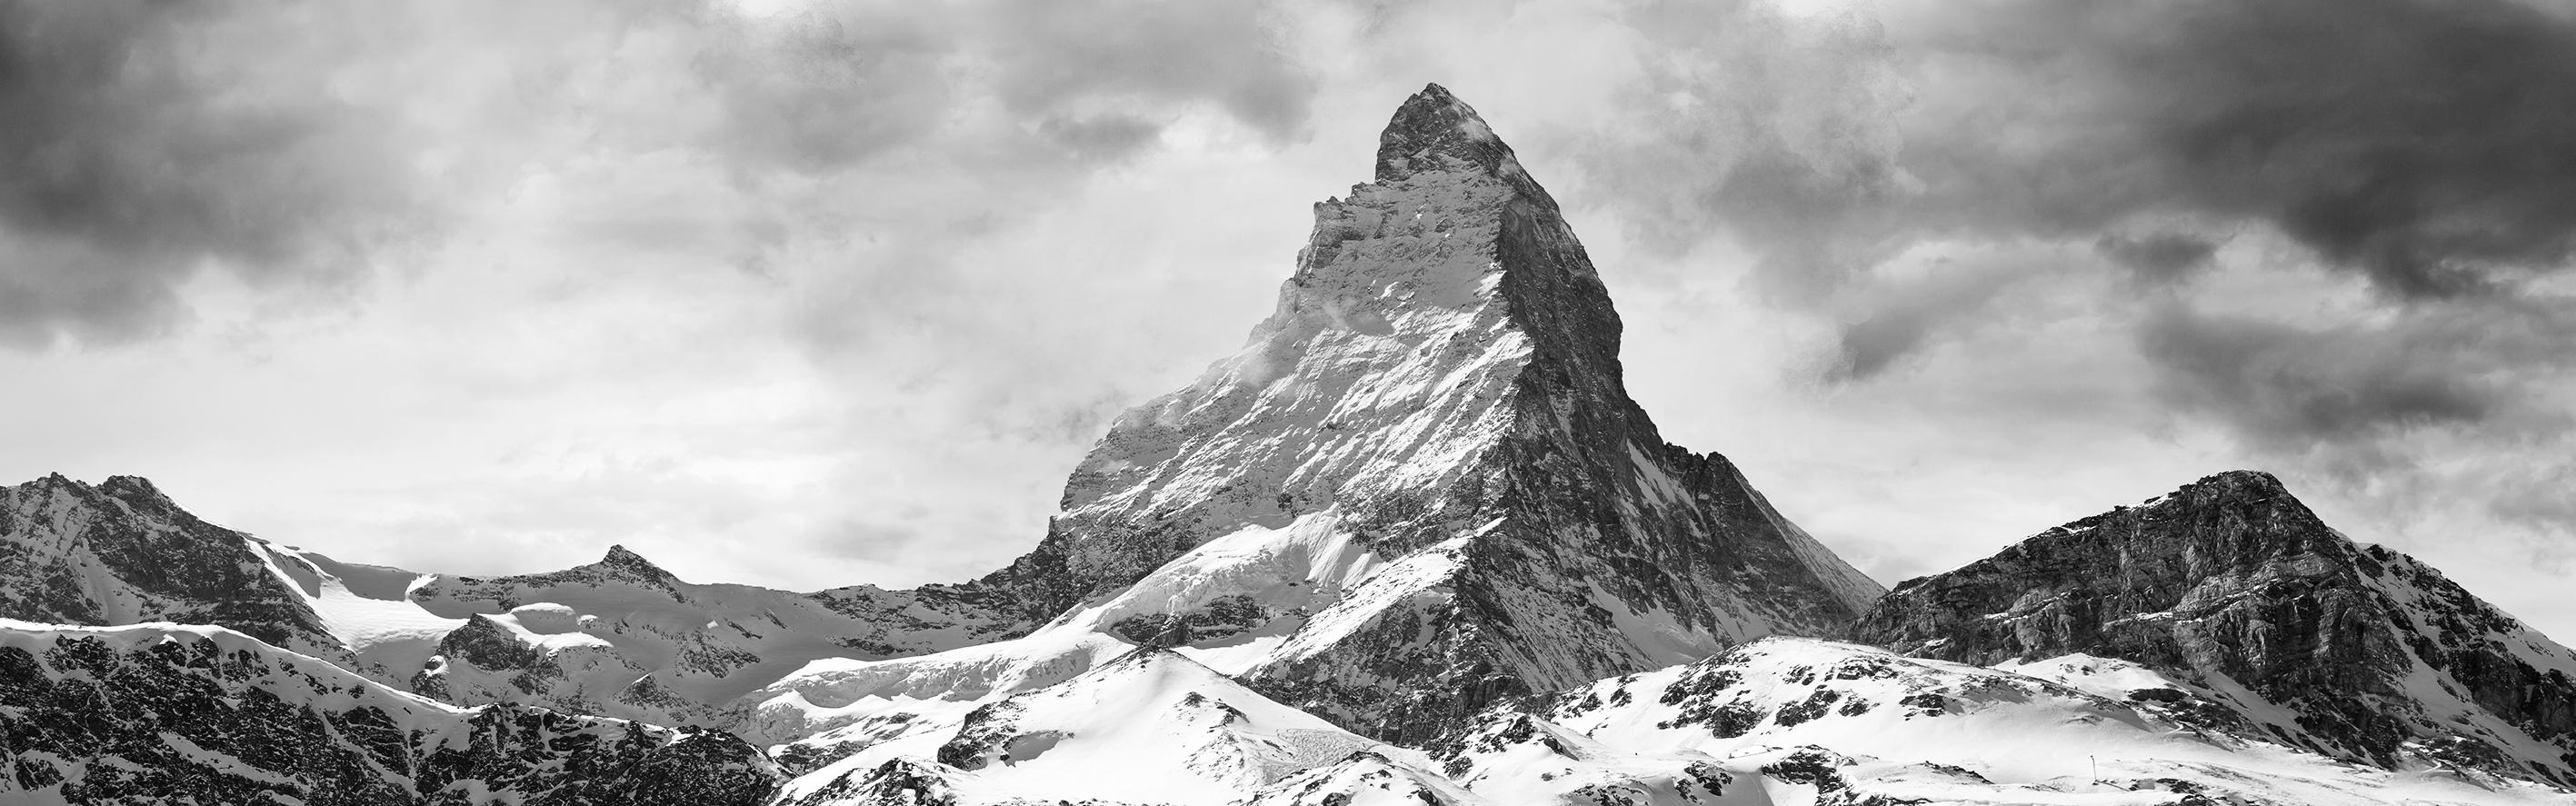 Panorama Berge